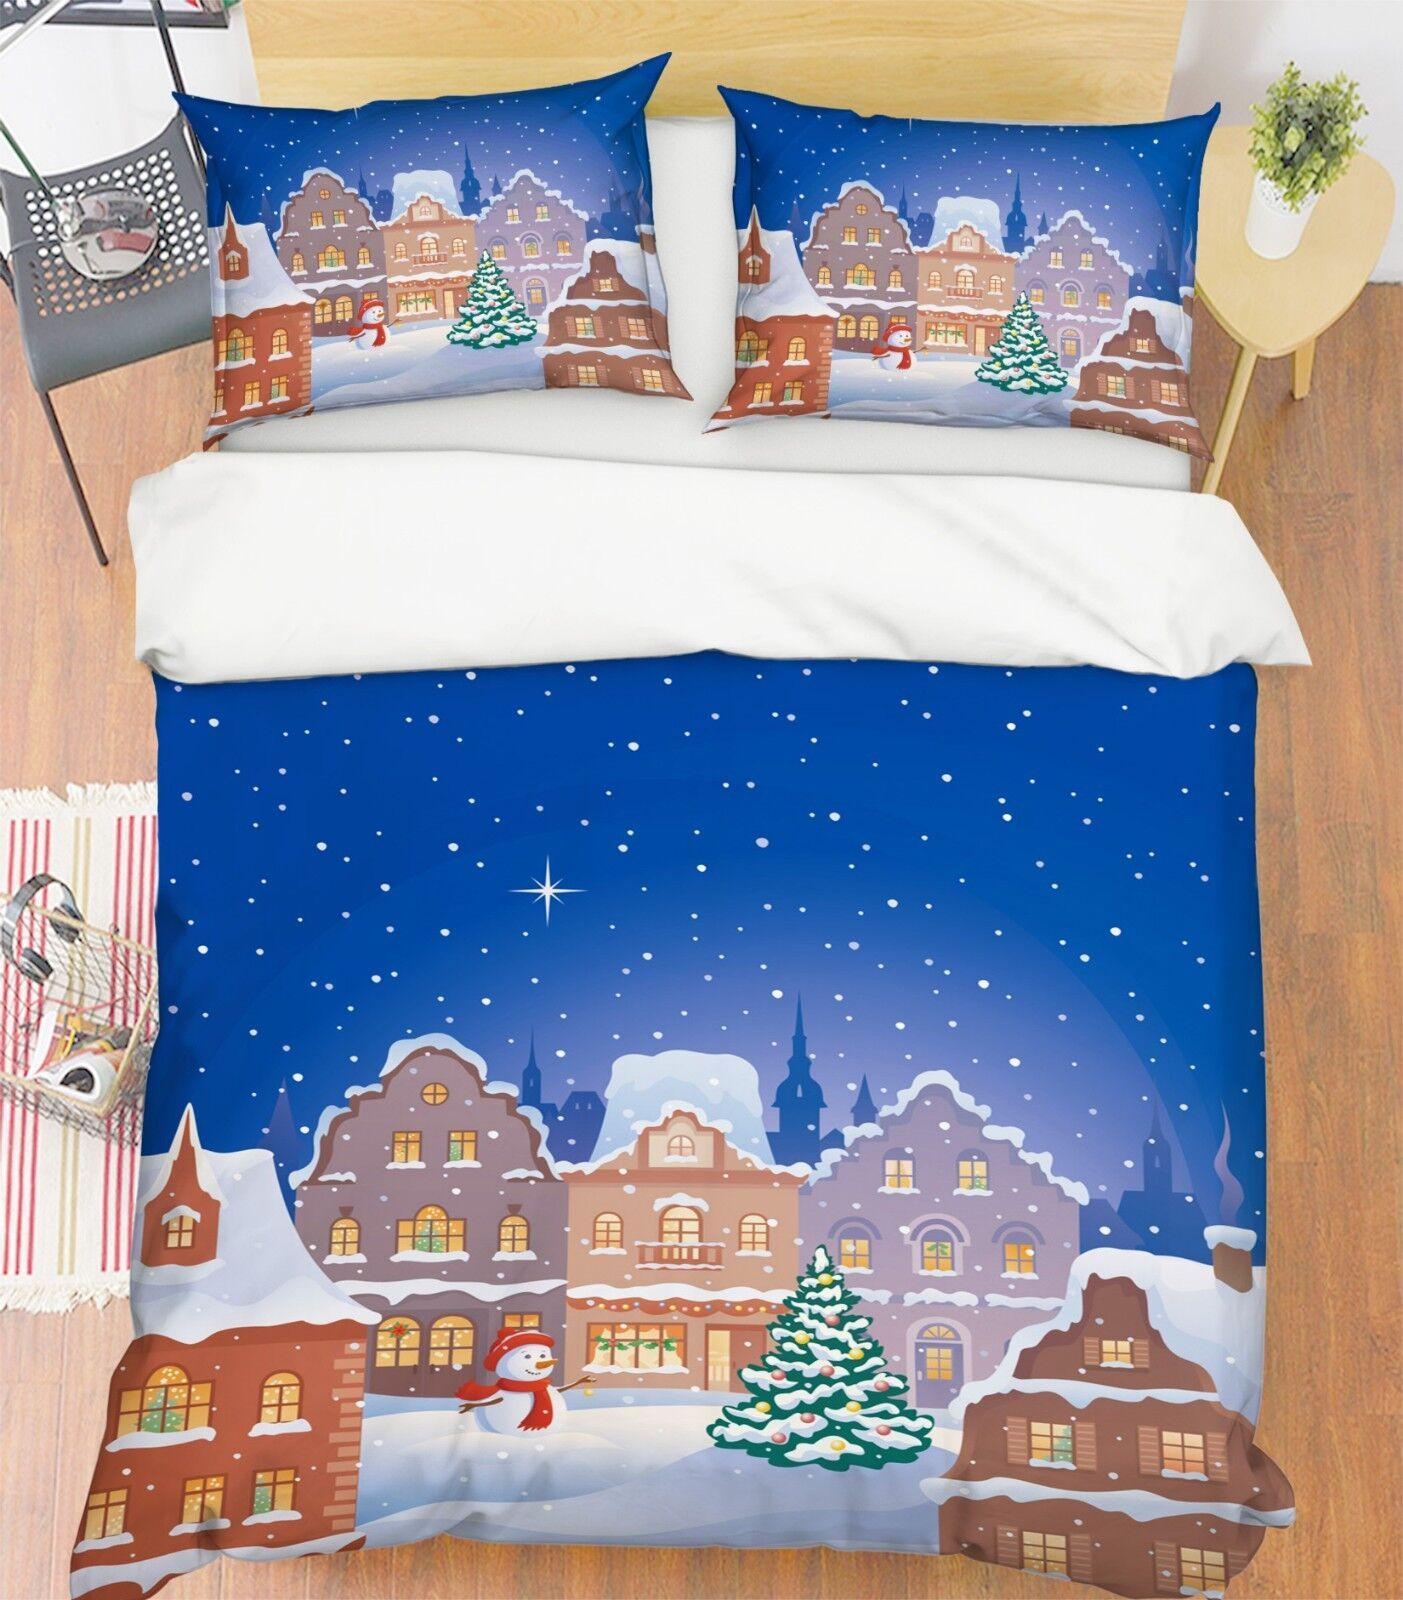 3D Christmas Xmas Starry 8 Bed Pillowcases Quilt Duvet Cover Set Single Queen UK